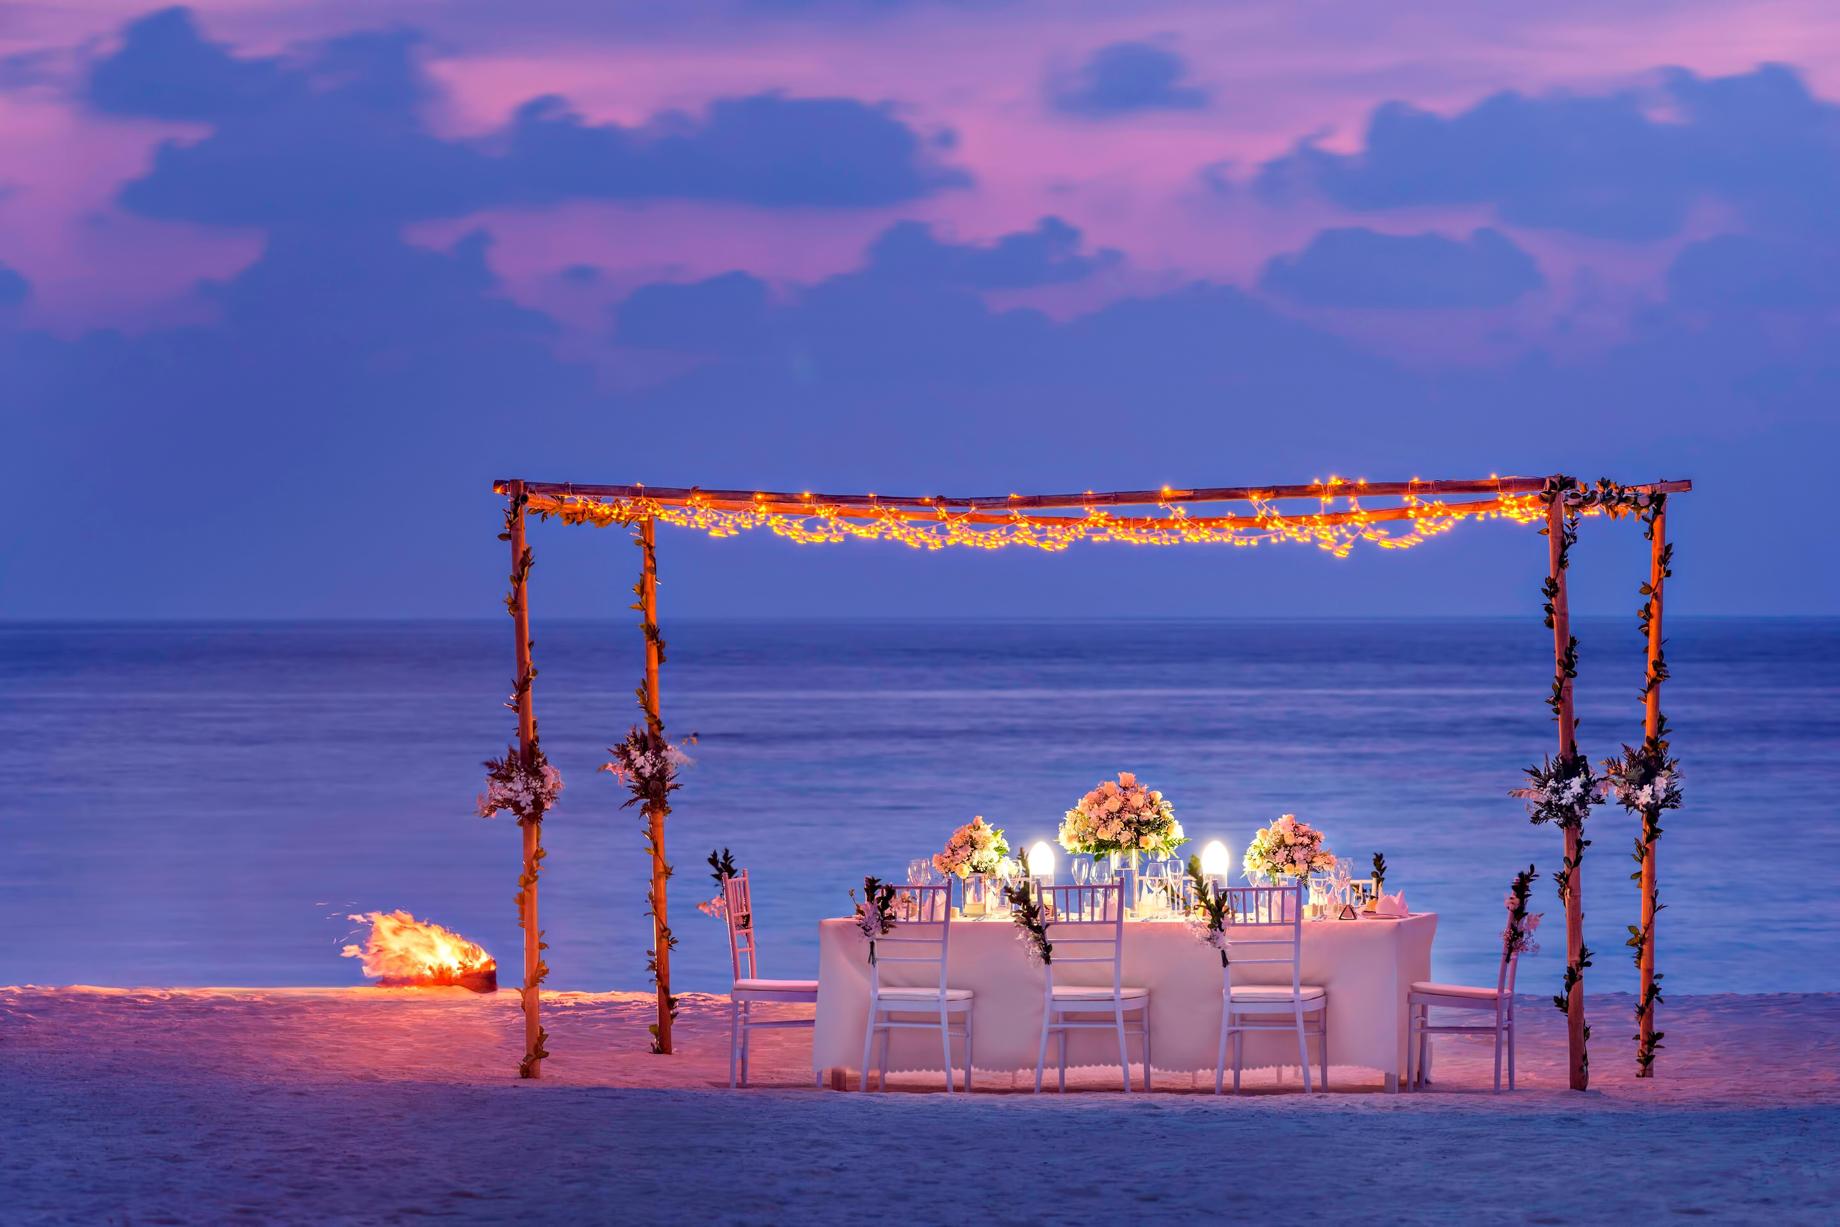 The St. Regis Maldives Vommuli Luxury Resort - Dhaalu Atoll, Maldives - Beach Dinner Night